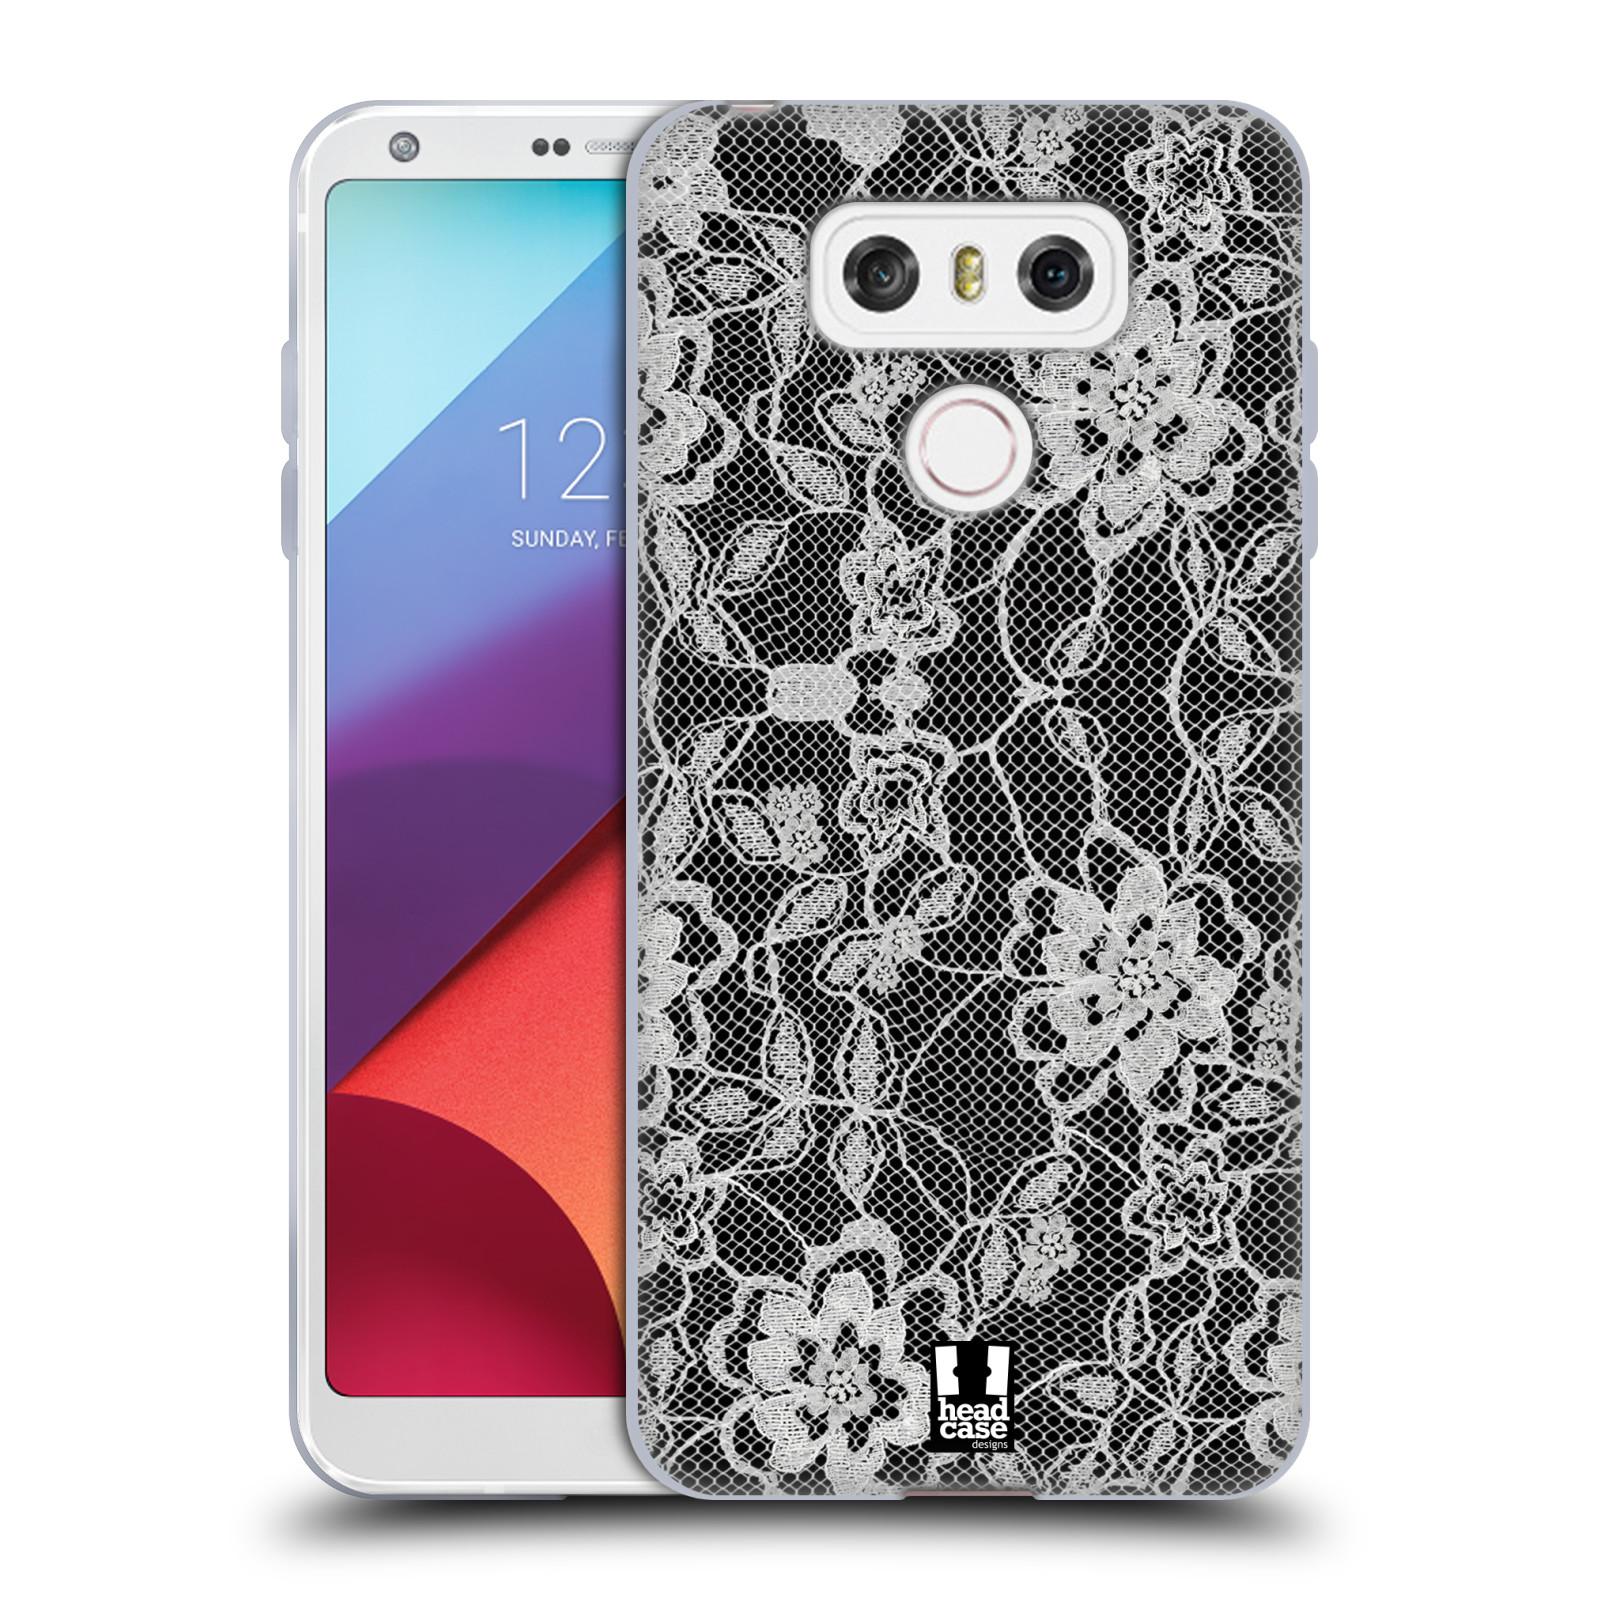 Silikonové pouzdro na mobil LG G6 - Head Case FLOWERY KRAJKA